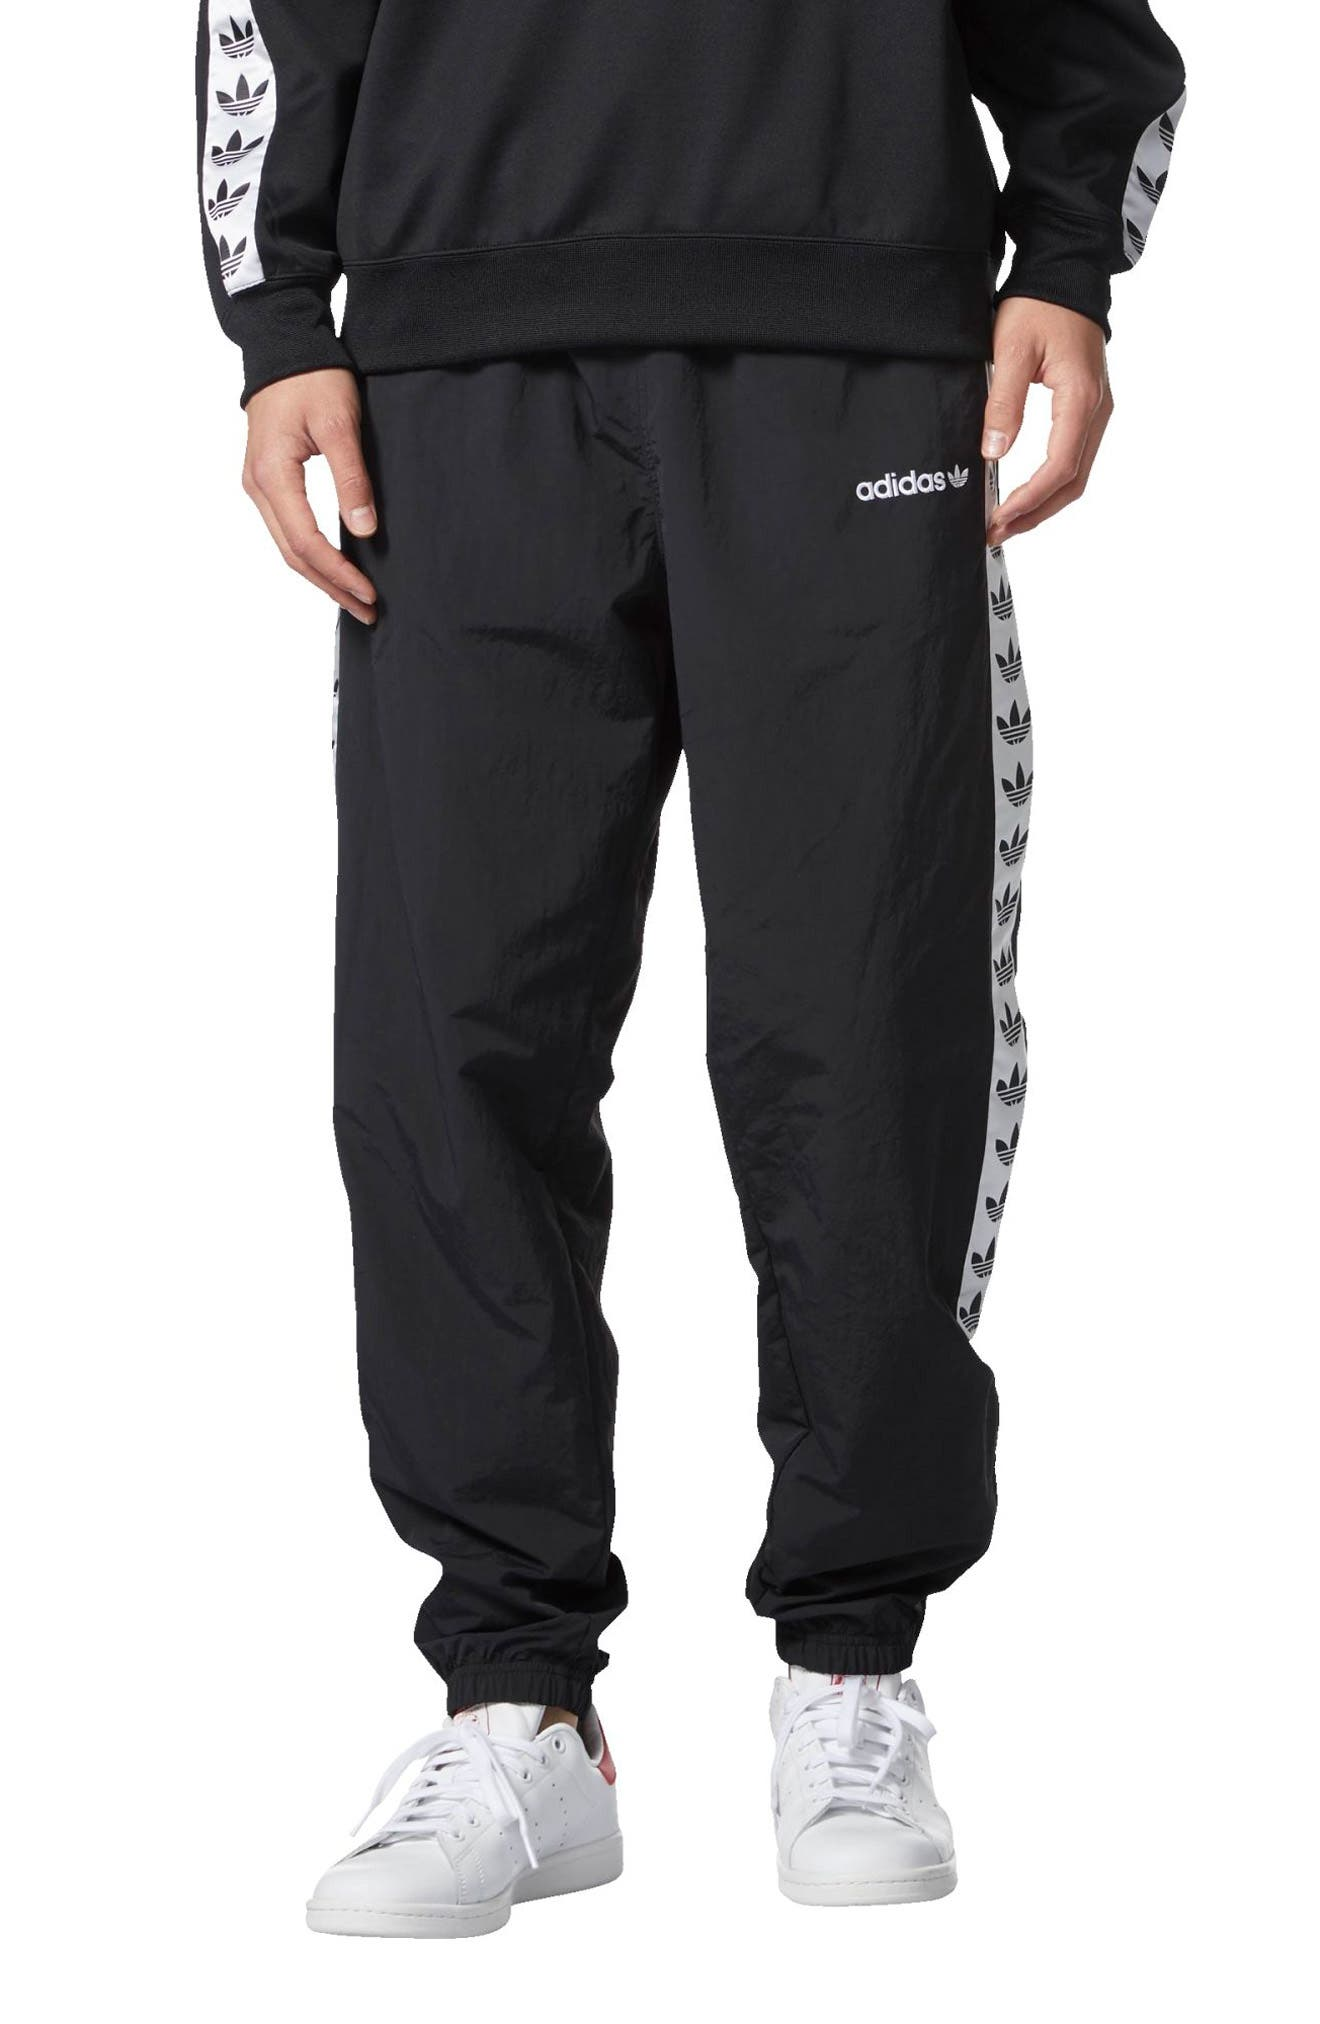 adidas Originals TNT Trefoil Wind Pants